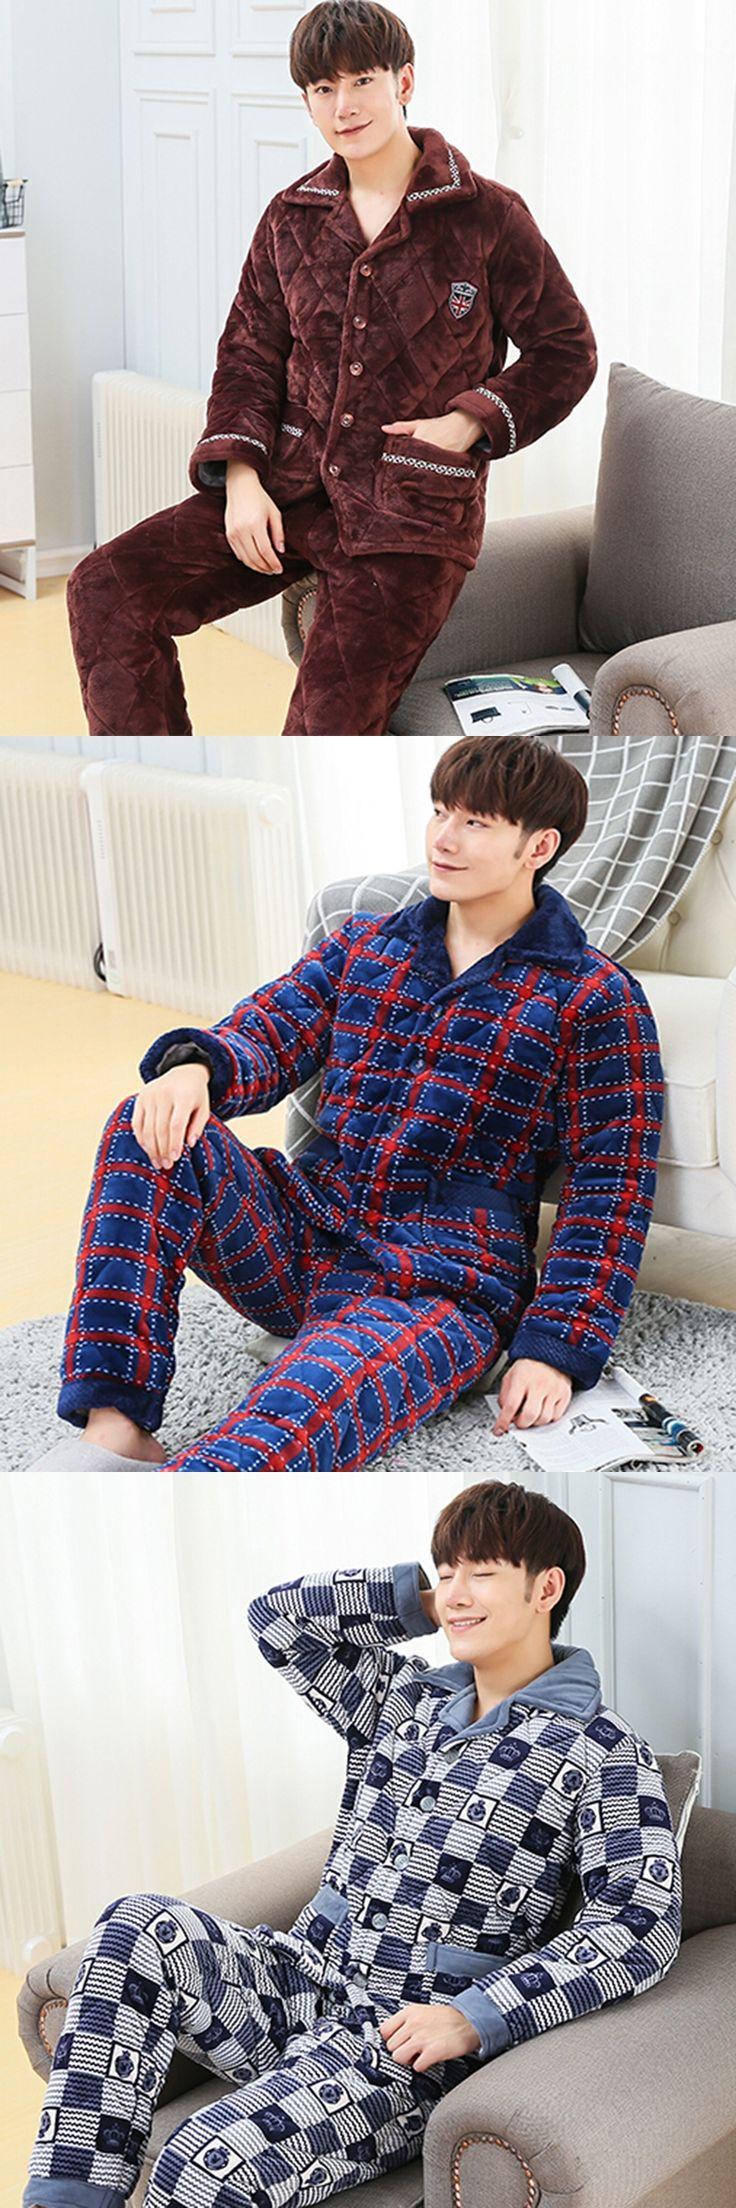 Hot sale  Winter Men's Flannel Pajamas Sets Fashion Casual Thickening plus  Sleepwear Velvet  Men's male thermal  pajamas